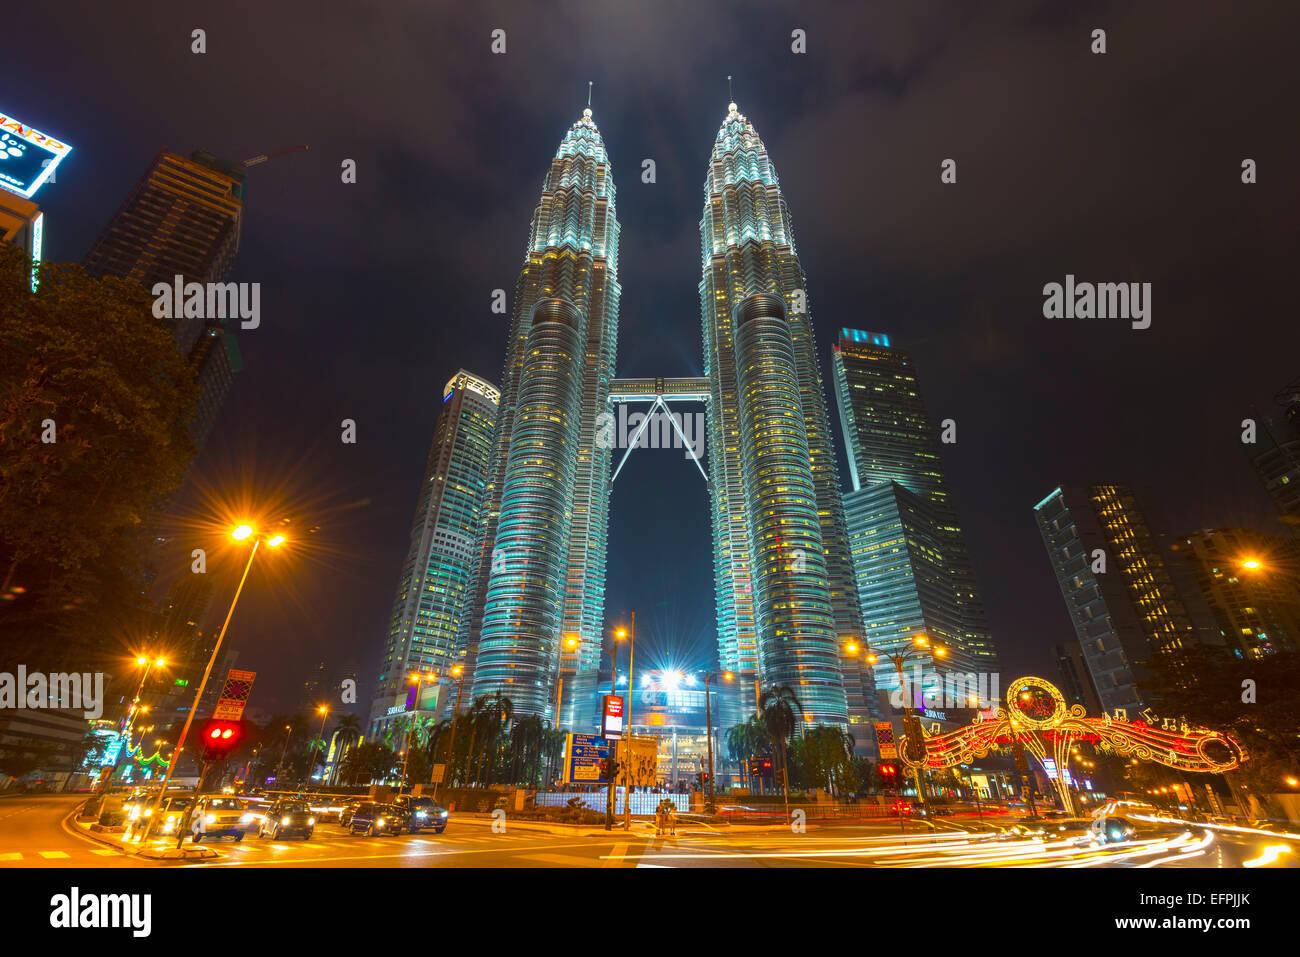 Torri Petronas, Kuala Lumpur, Malesia, Asia sud-orientale, Asia Immagini Stock